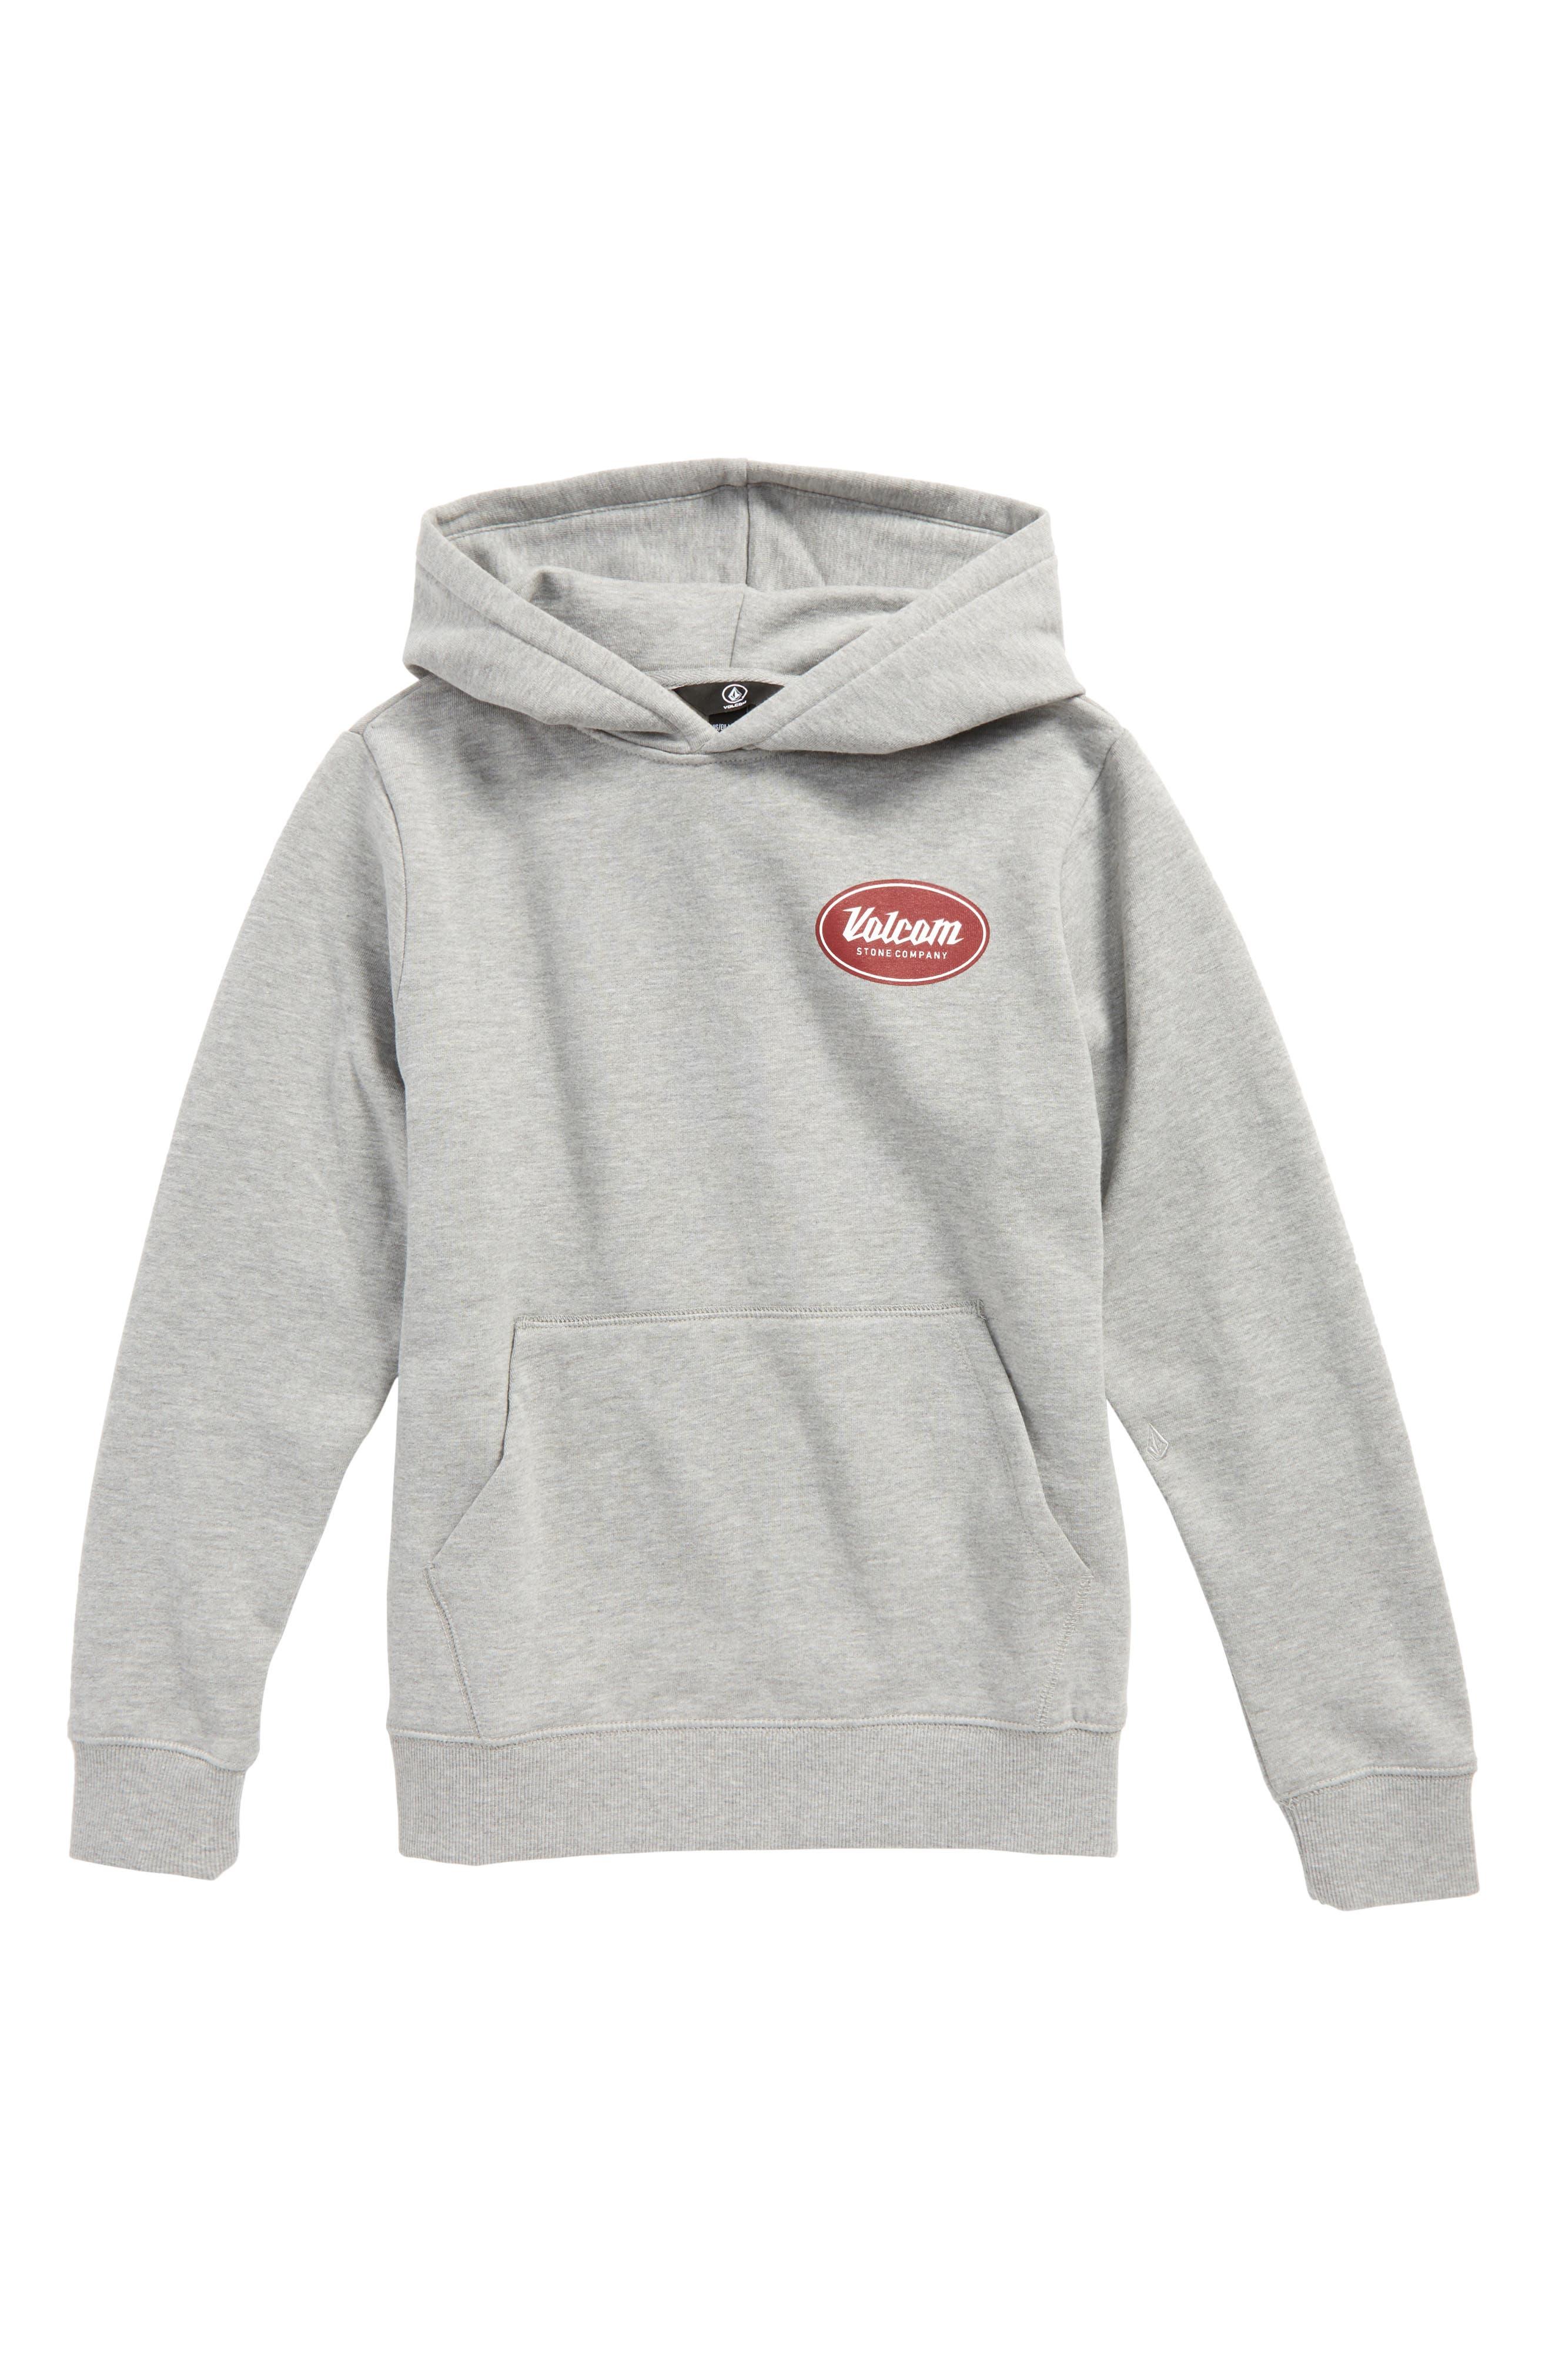 Supply Stone Hoodie,                         Main,                         color, Grey